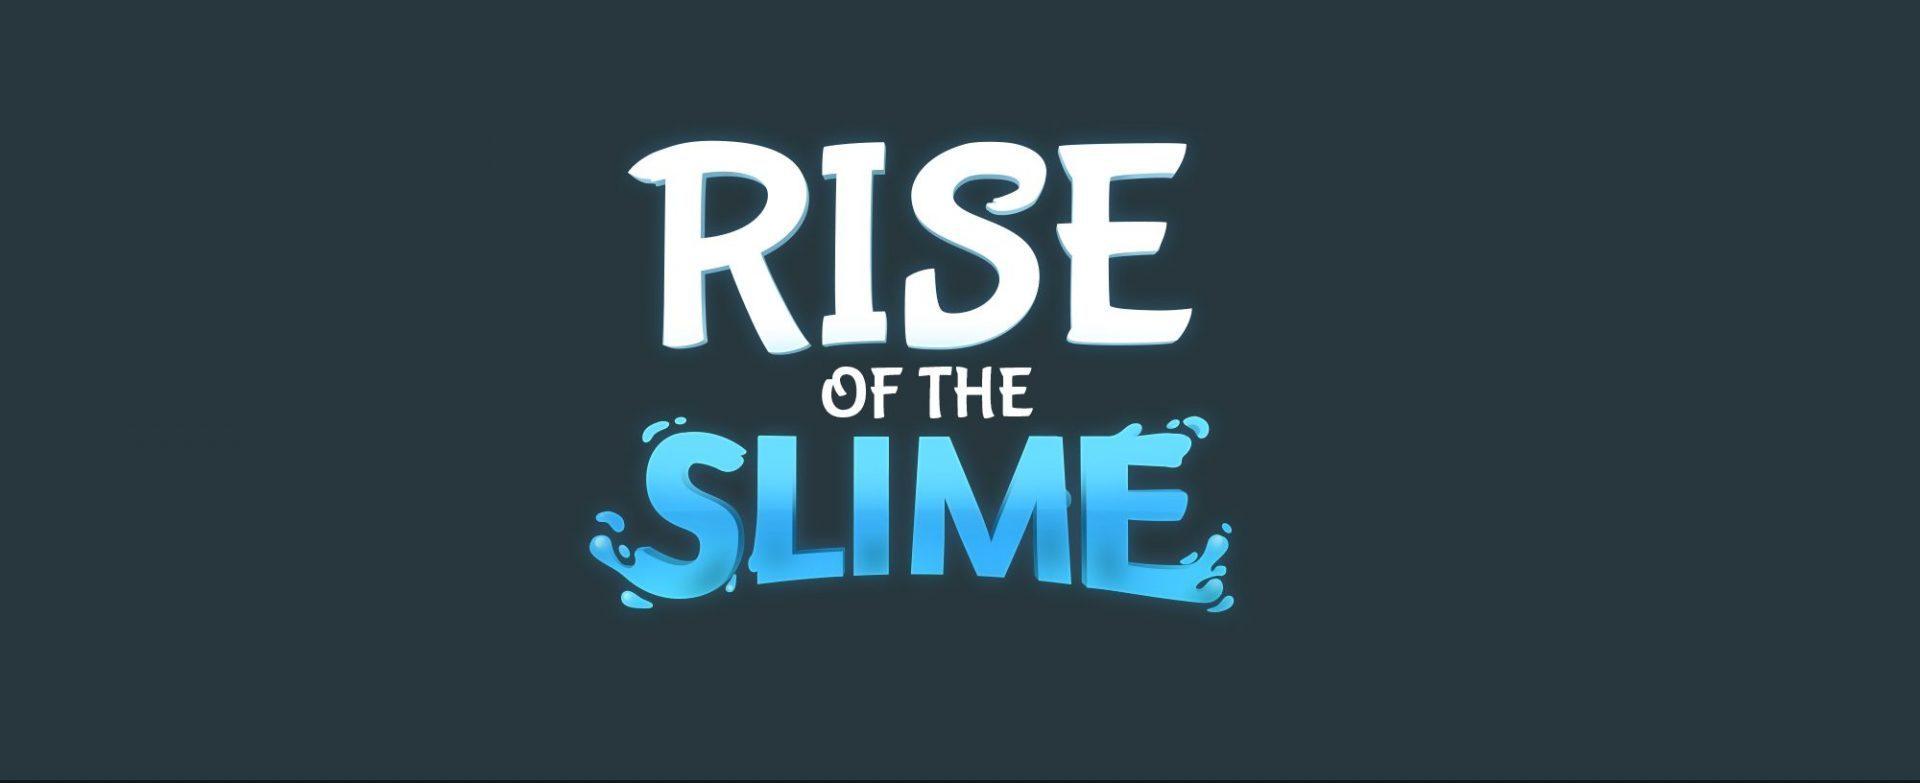 可愛手繪風的輕度爬塔遊戲 – Rise of the Slime